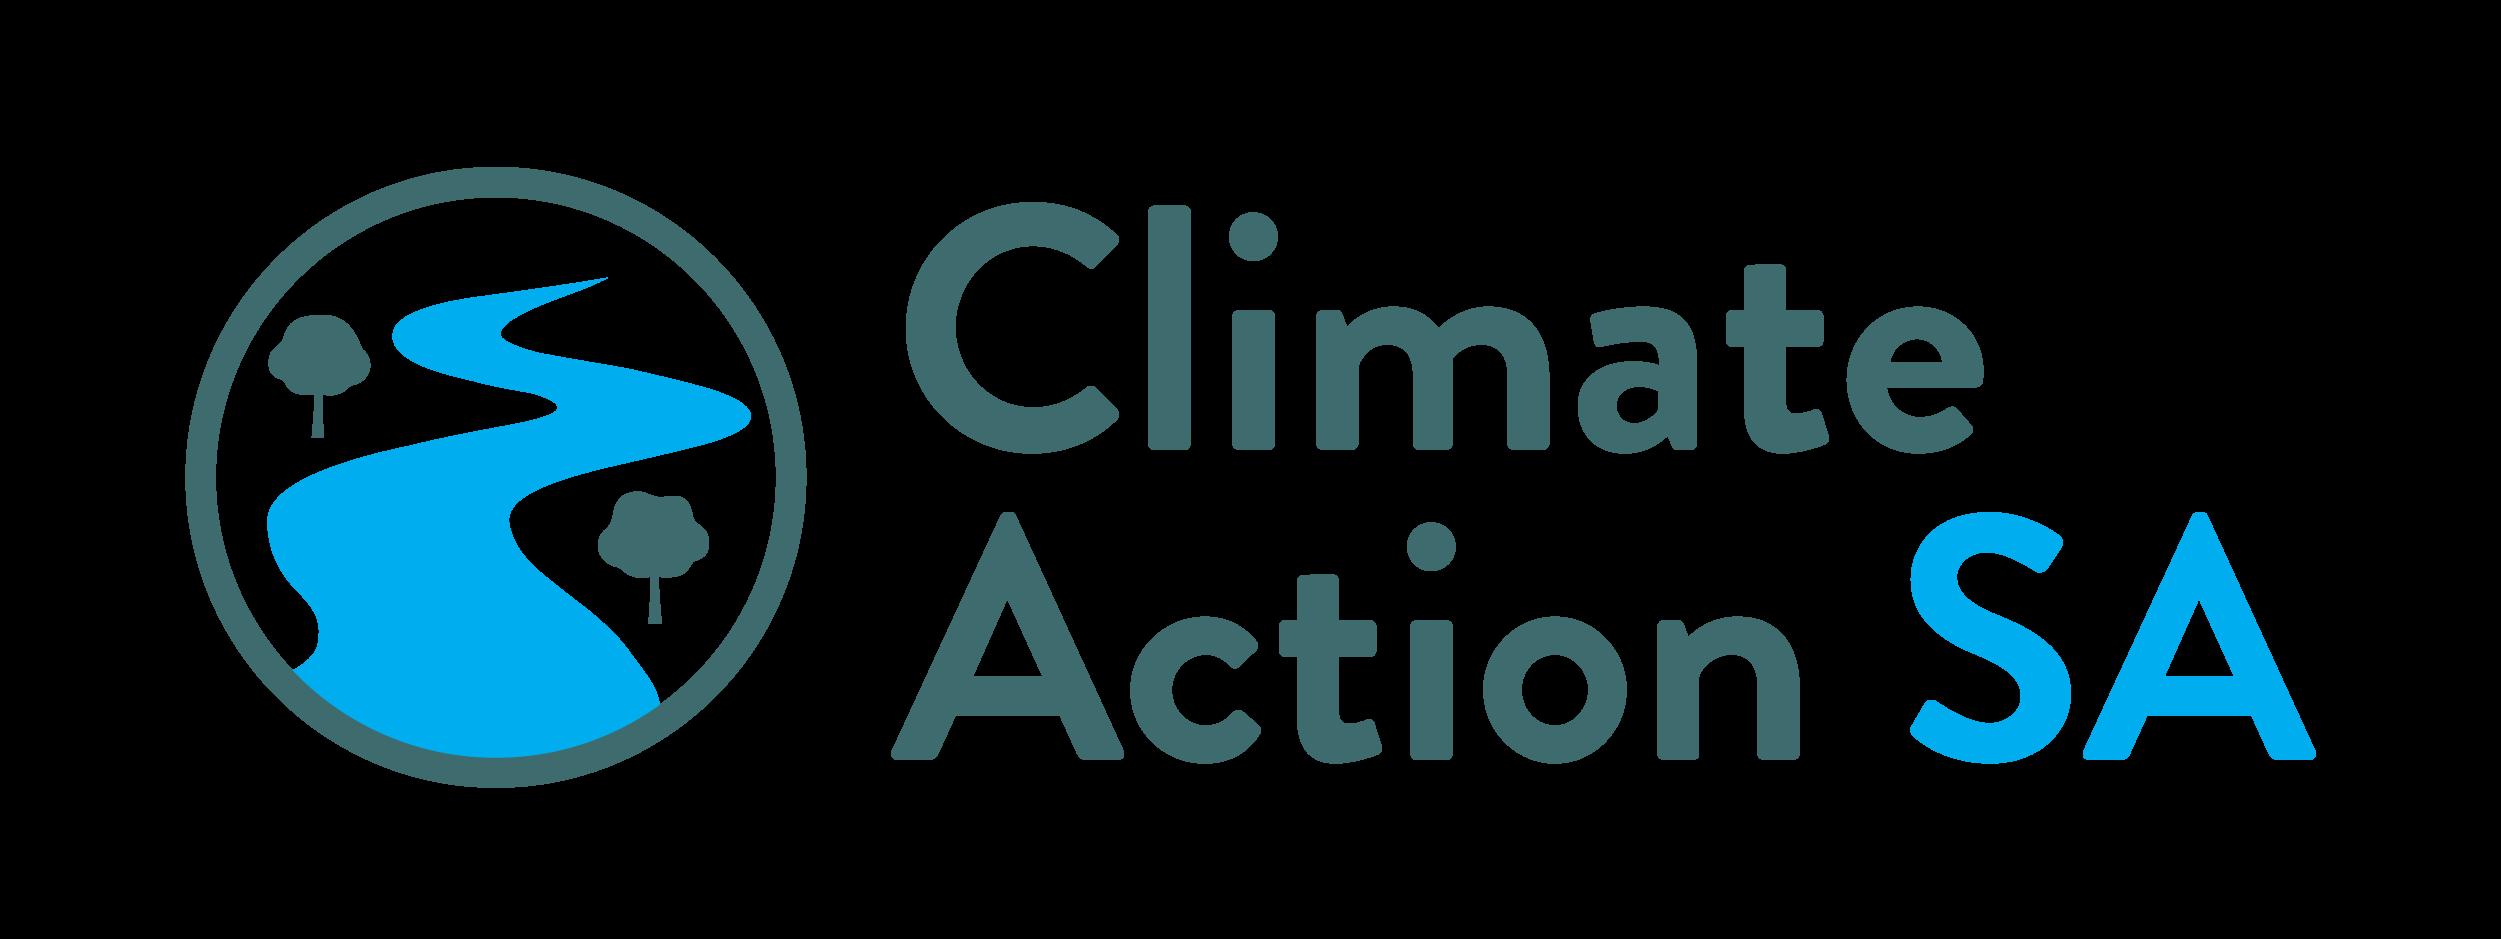 2018-04-12_climate_action_sa_logo